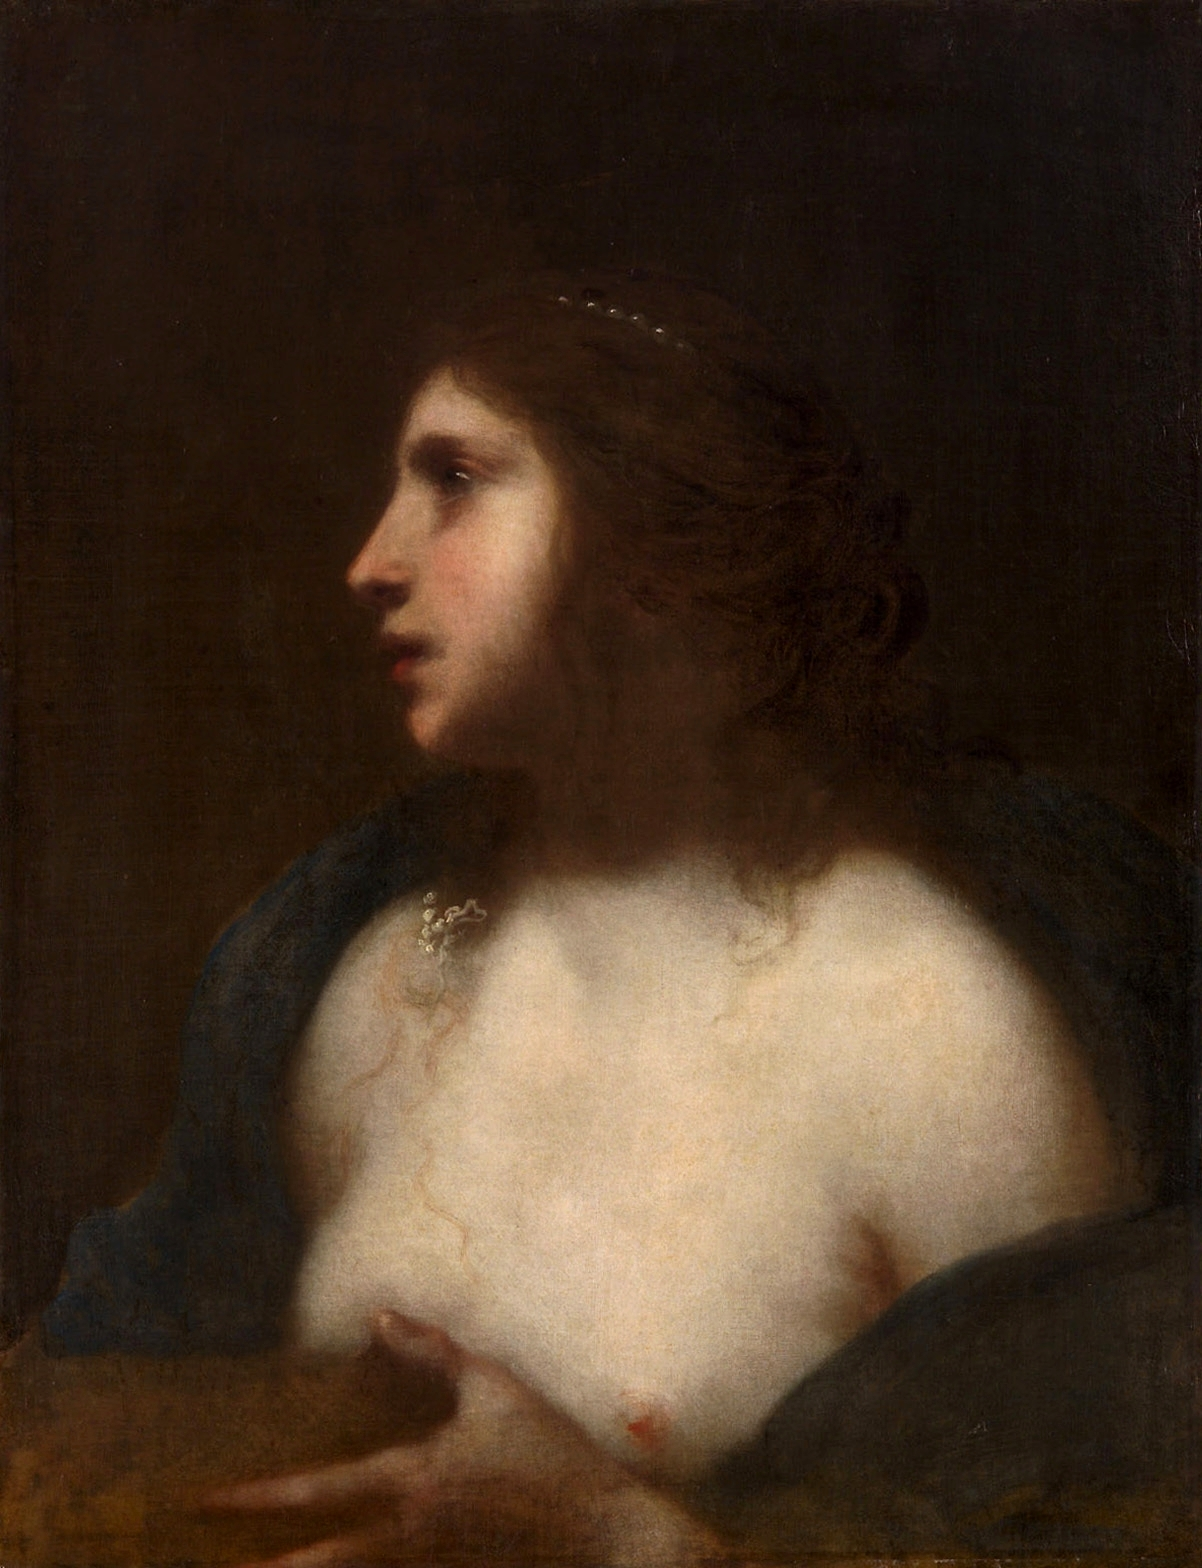 Кающаяся святая Мария Магдалина (The penitent Saint Mary Magdalen)_64.5 х 50_х.,м._Вена, Музей истории искусств.jpg